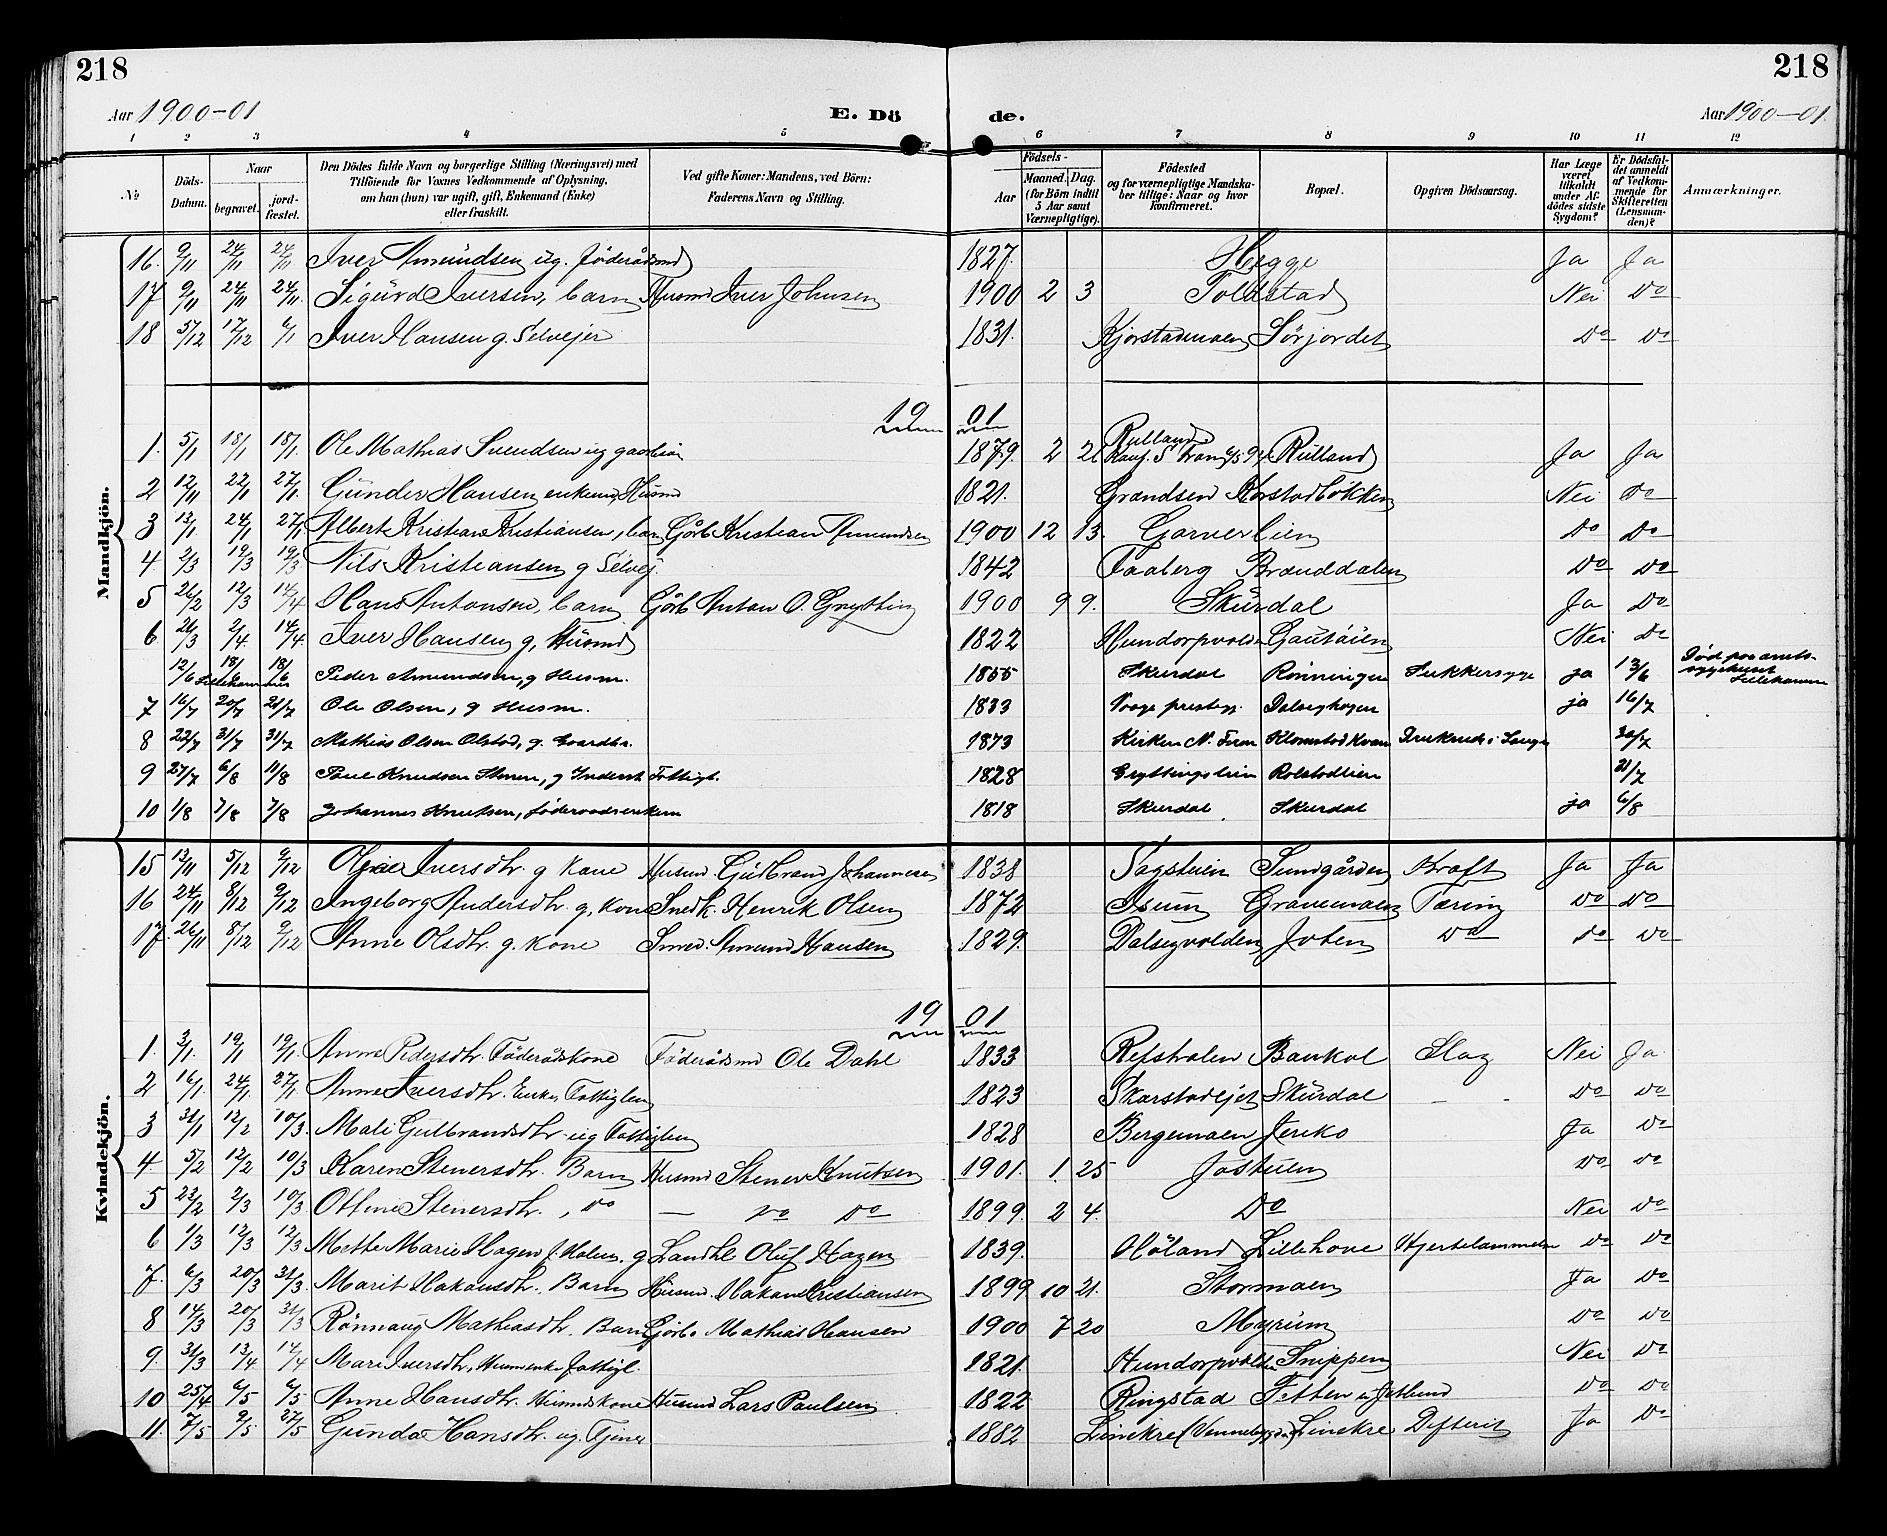 SAH, Sør-Fron prestekontor, H/Ha/Hab/L0004: Klokkerbok nr. 4, 1896-1911, s. 218